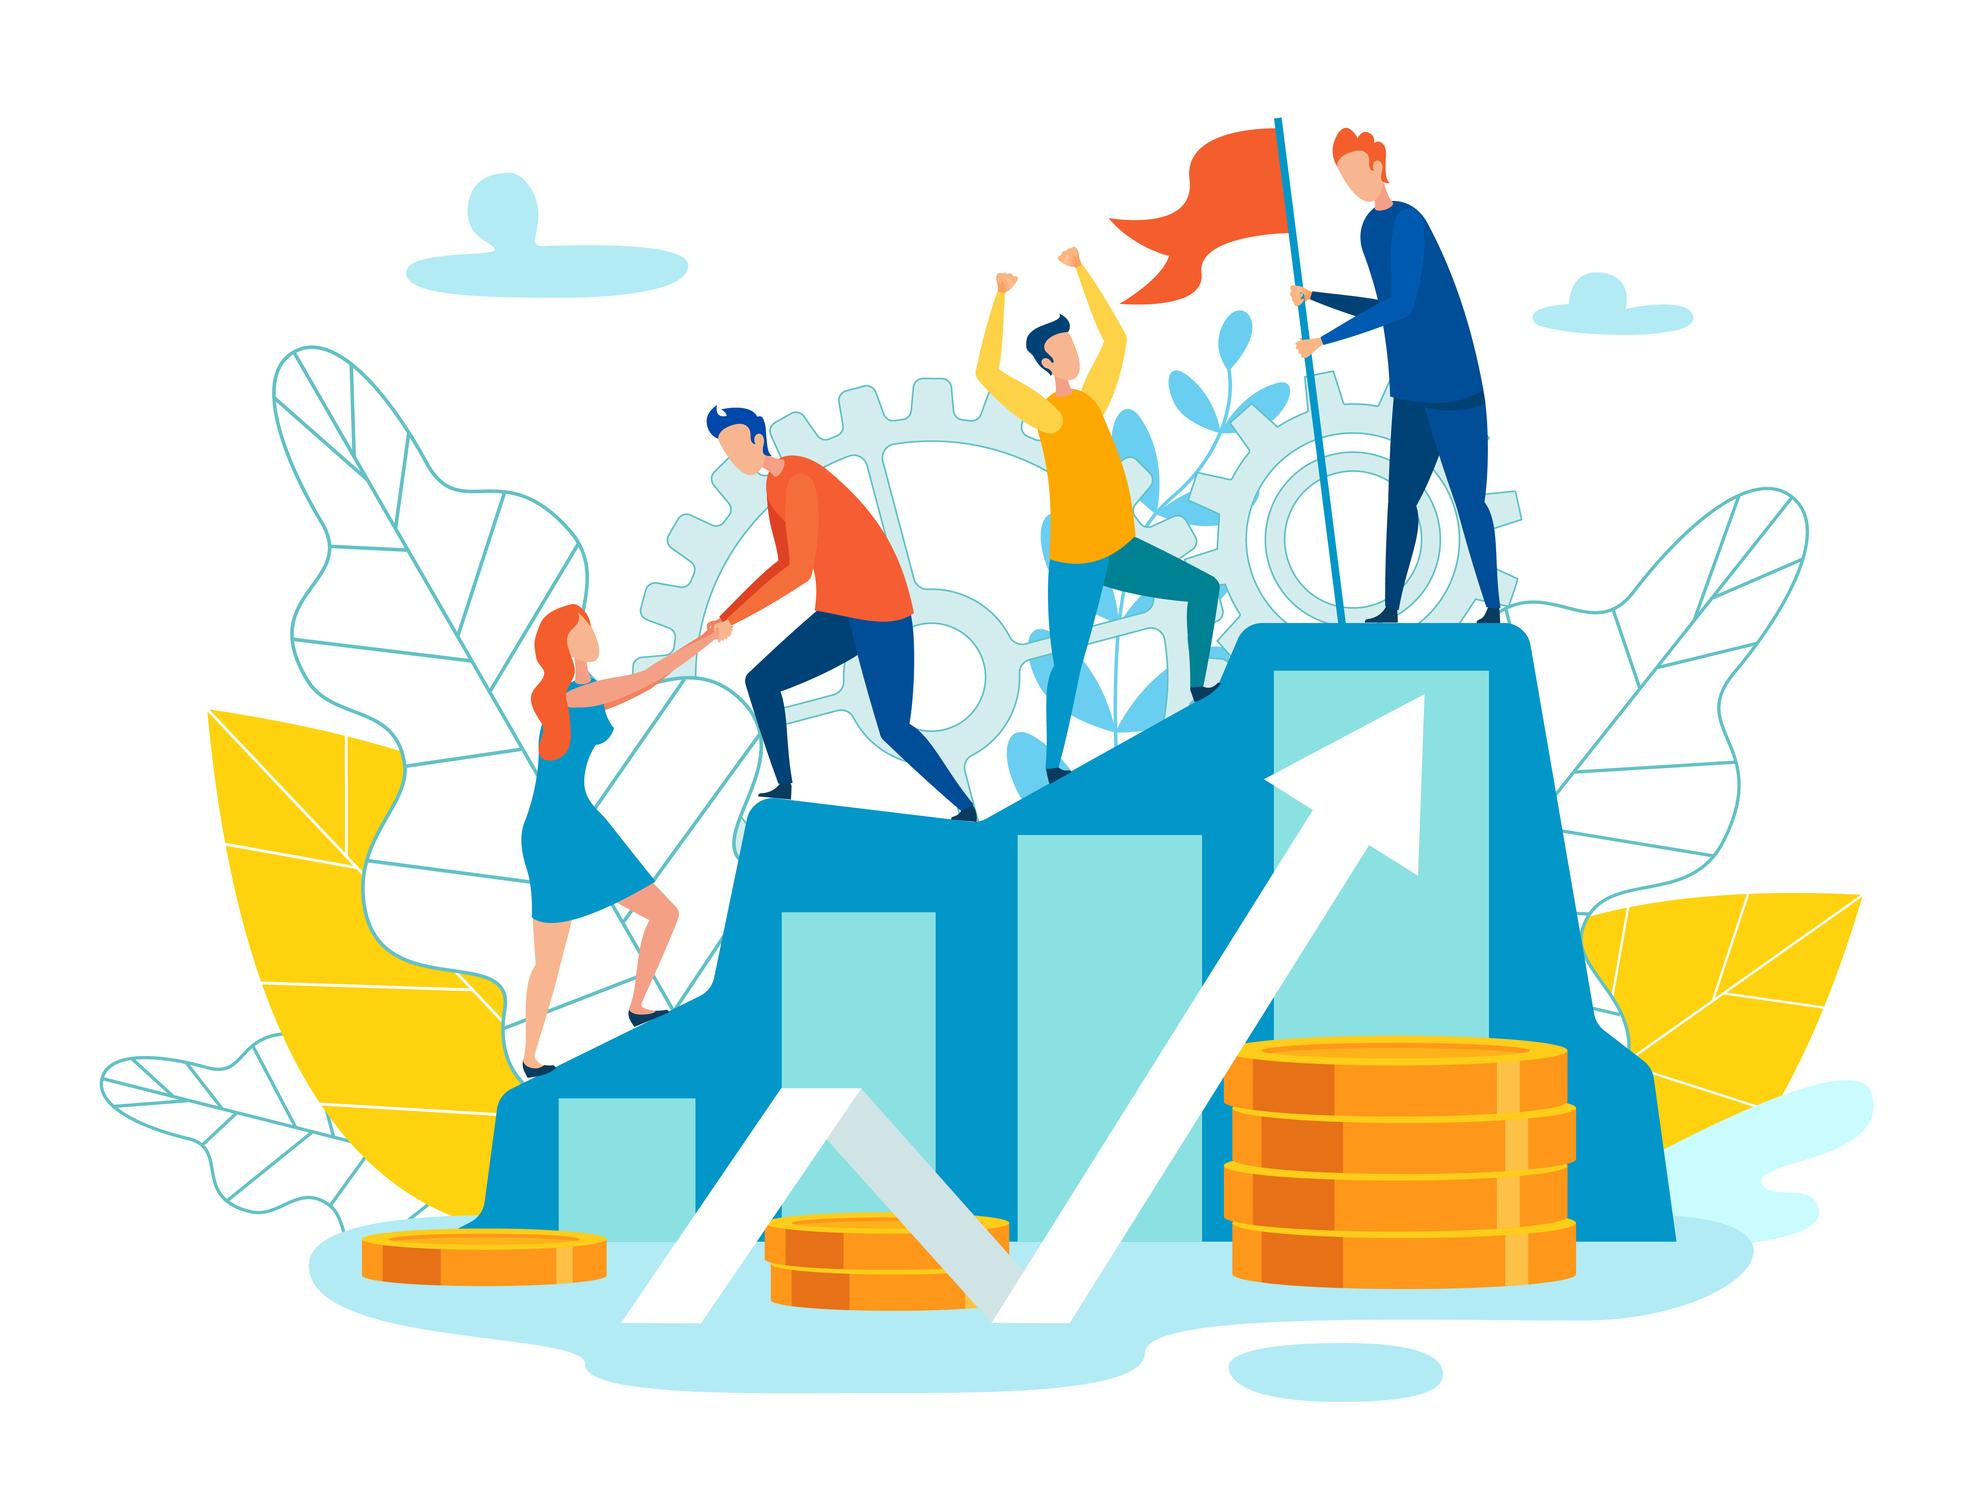 Advising Over $1 Billion in Assets